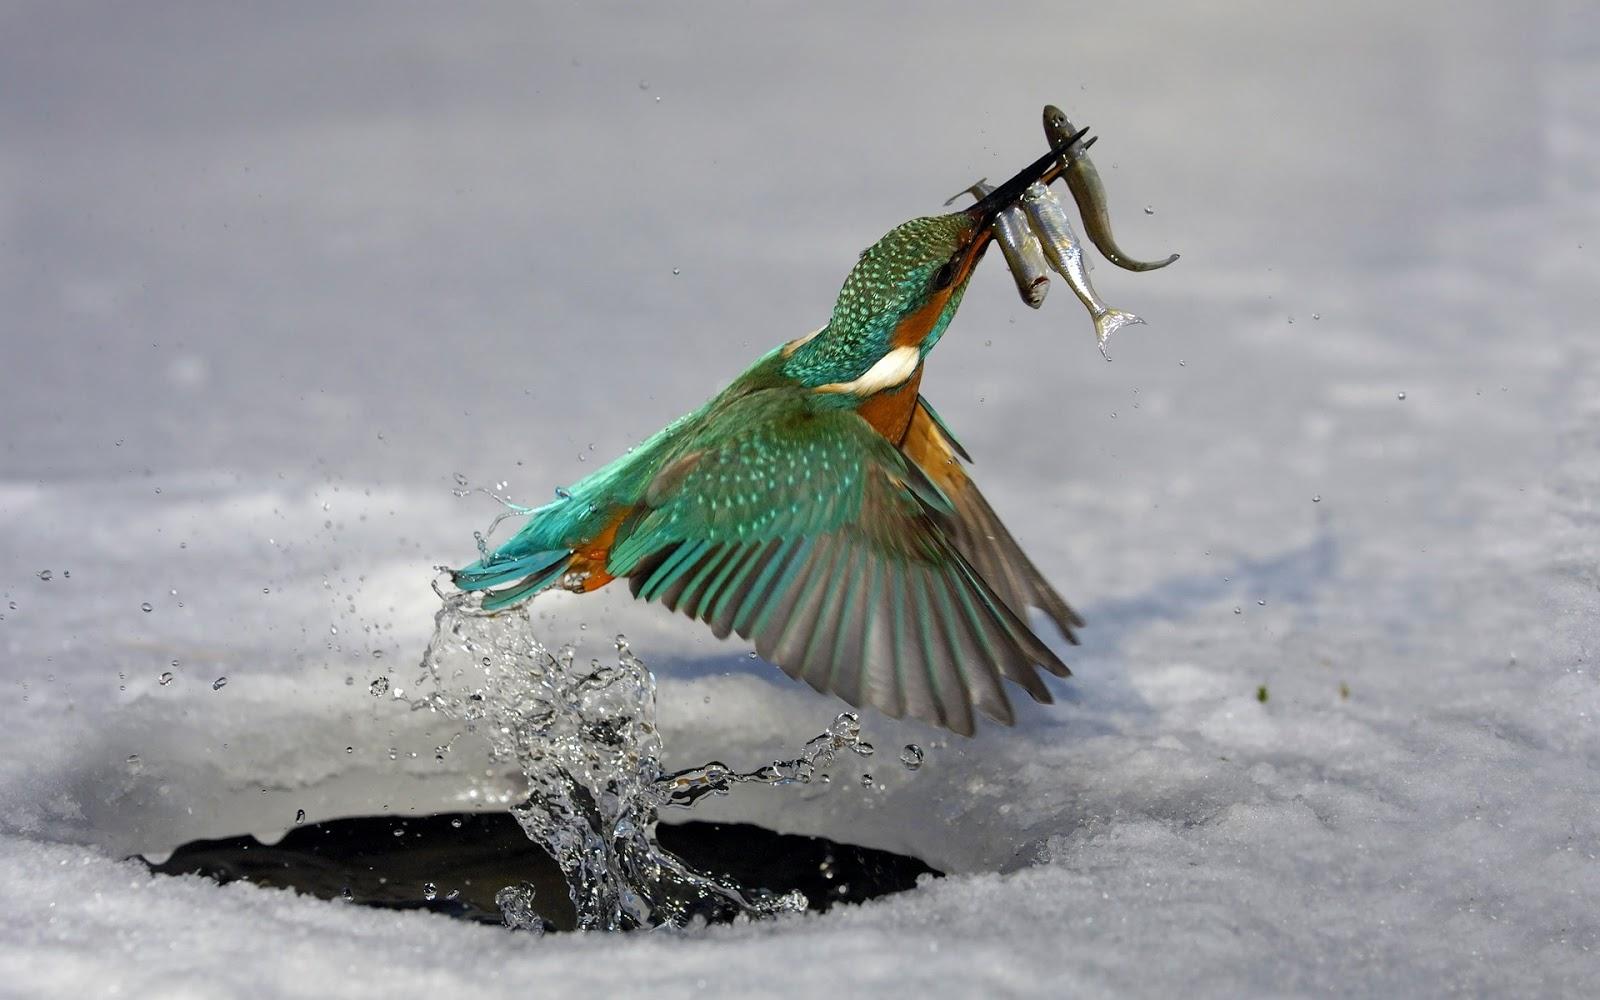 Must see Wallpaper High Quality Bird - Water_ice_birds_fish_kingfisher_wallpaper_of_2013  2018_75184.jpg